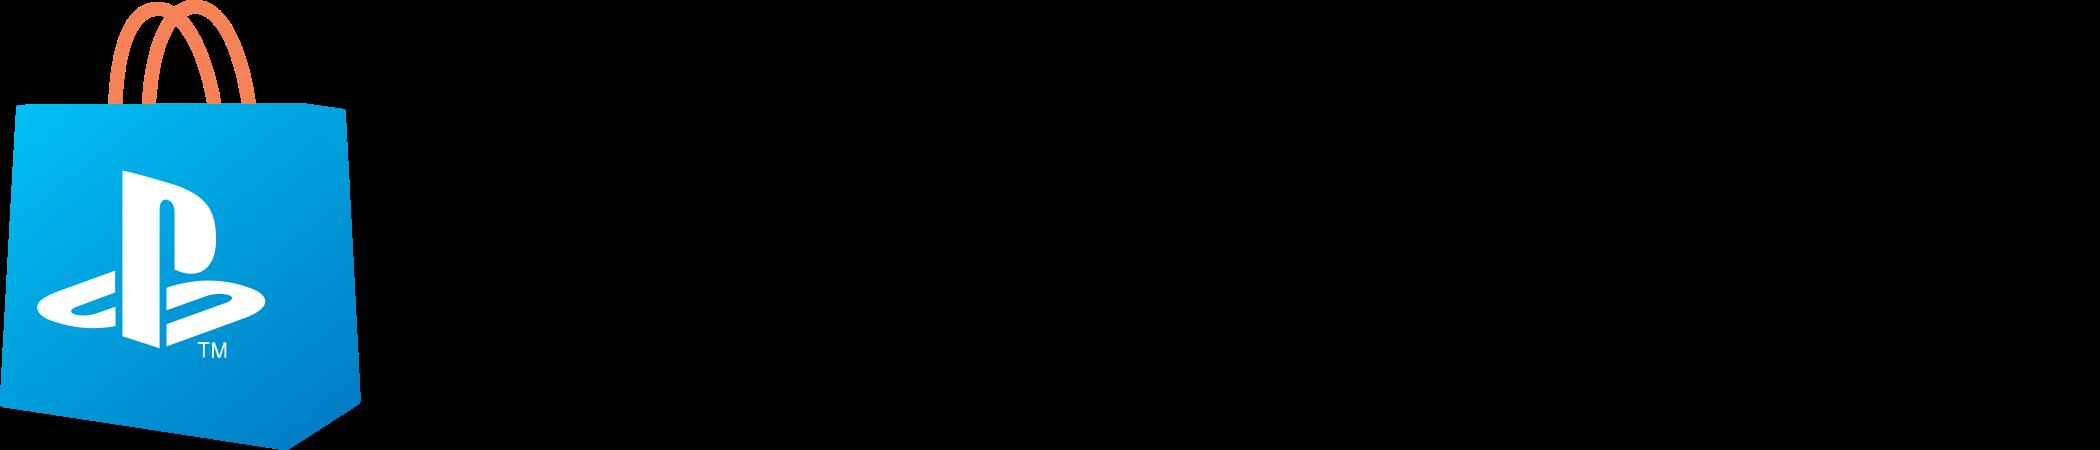 playstation store logo 2 - PlayStation Store Logo